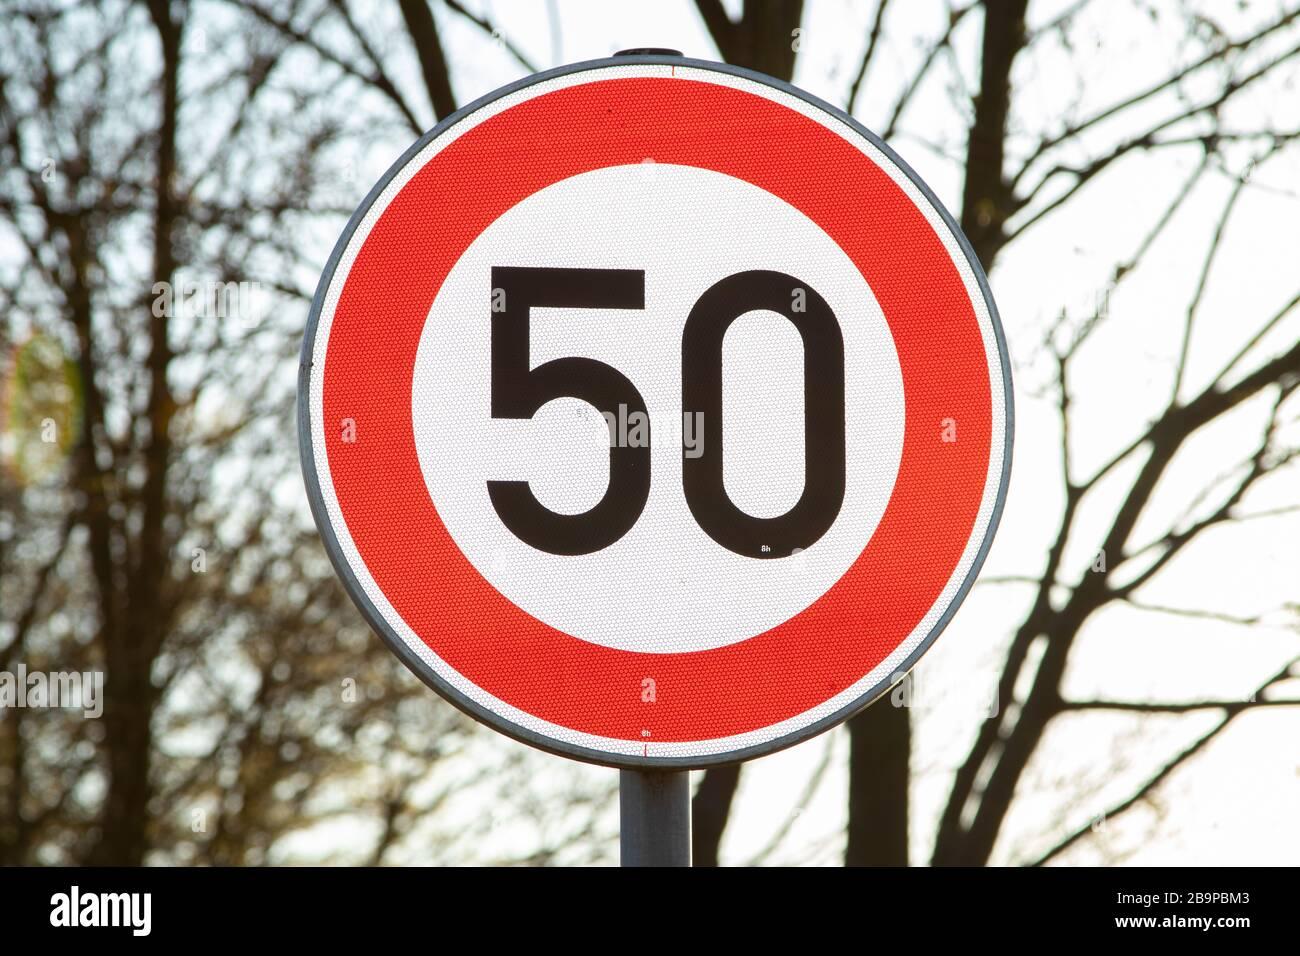 german speed limit sign 50 kmh Stock Photo